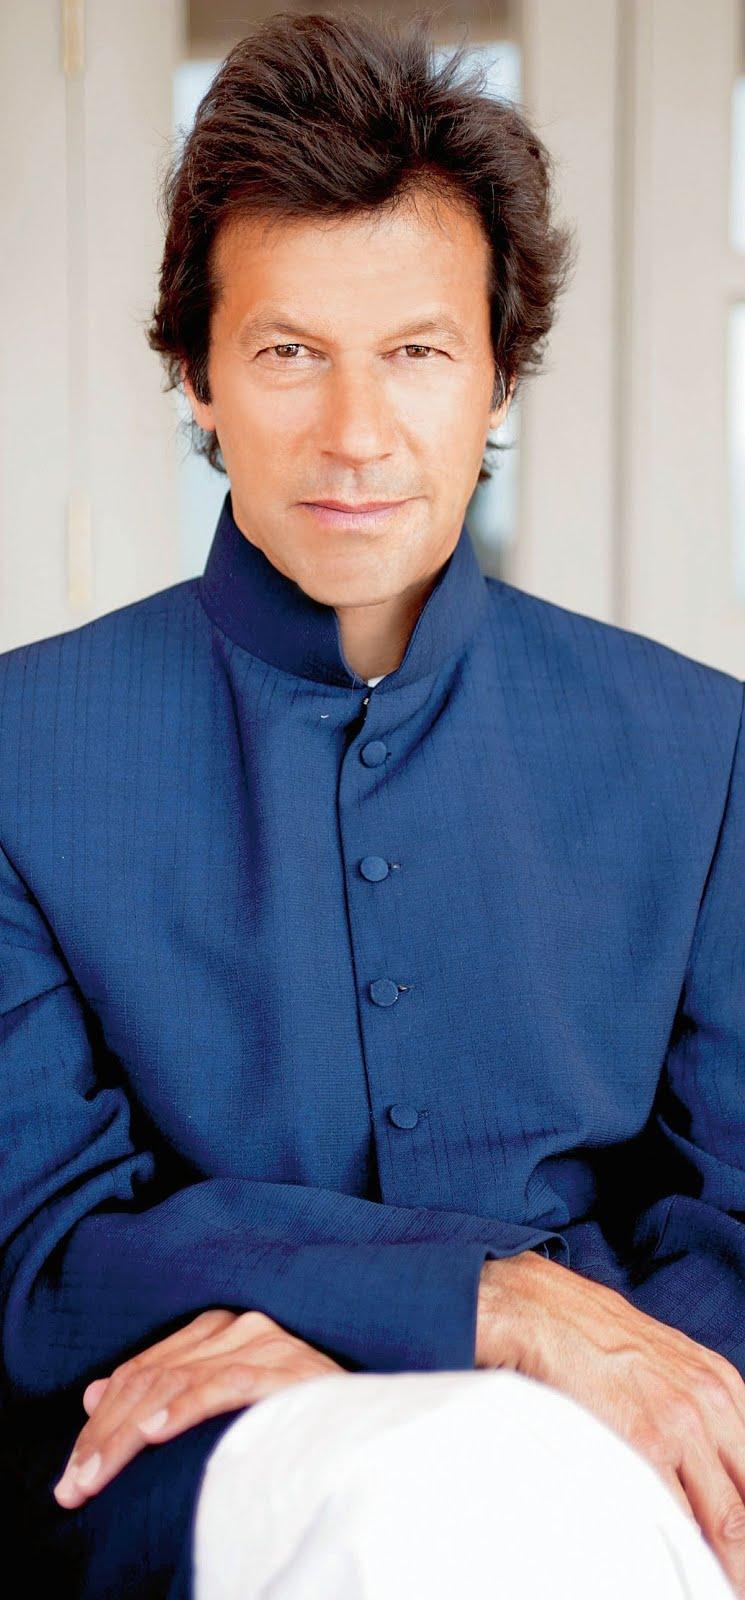 PM Imran Khan Unseen Rare Photos | Pakistani Cricketer ...